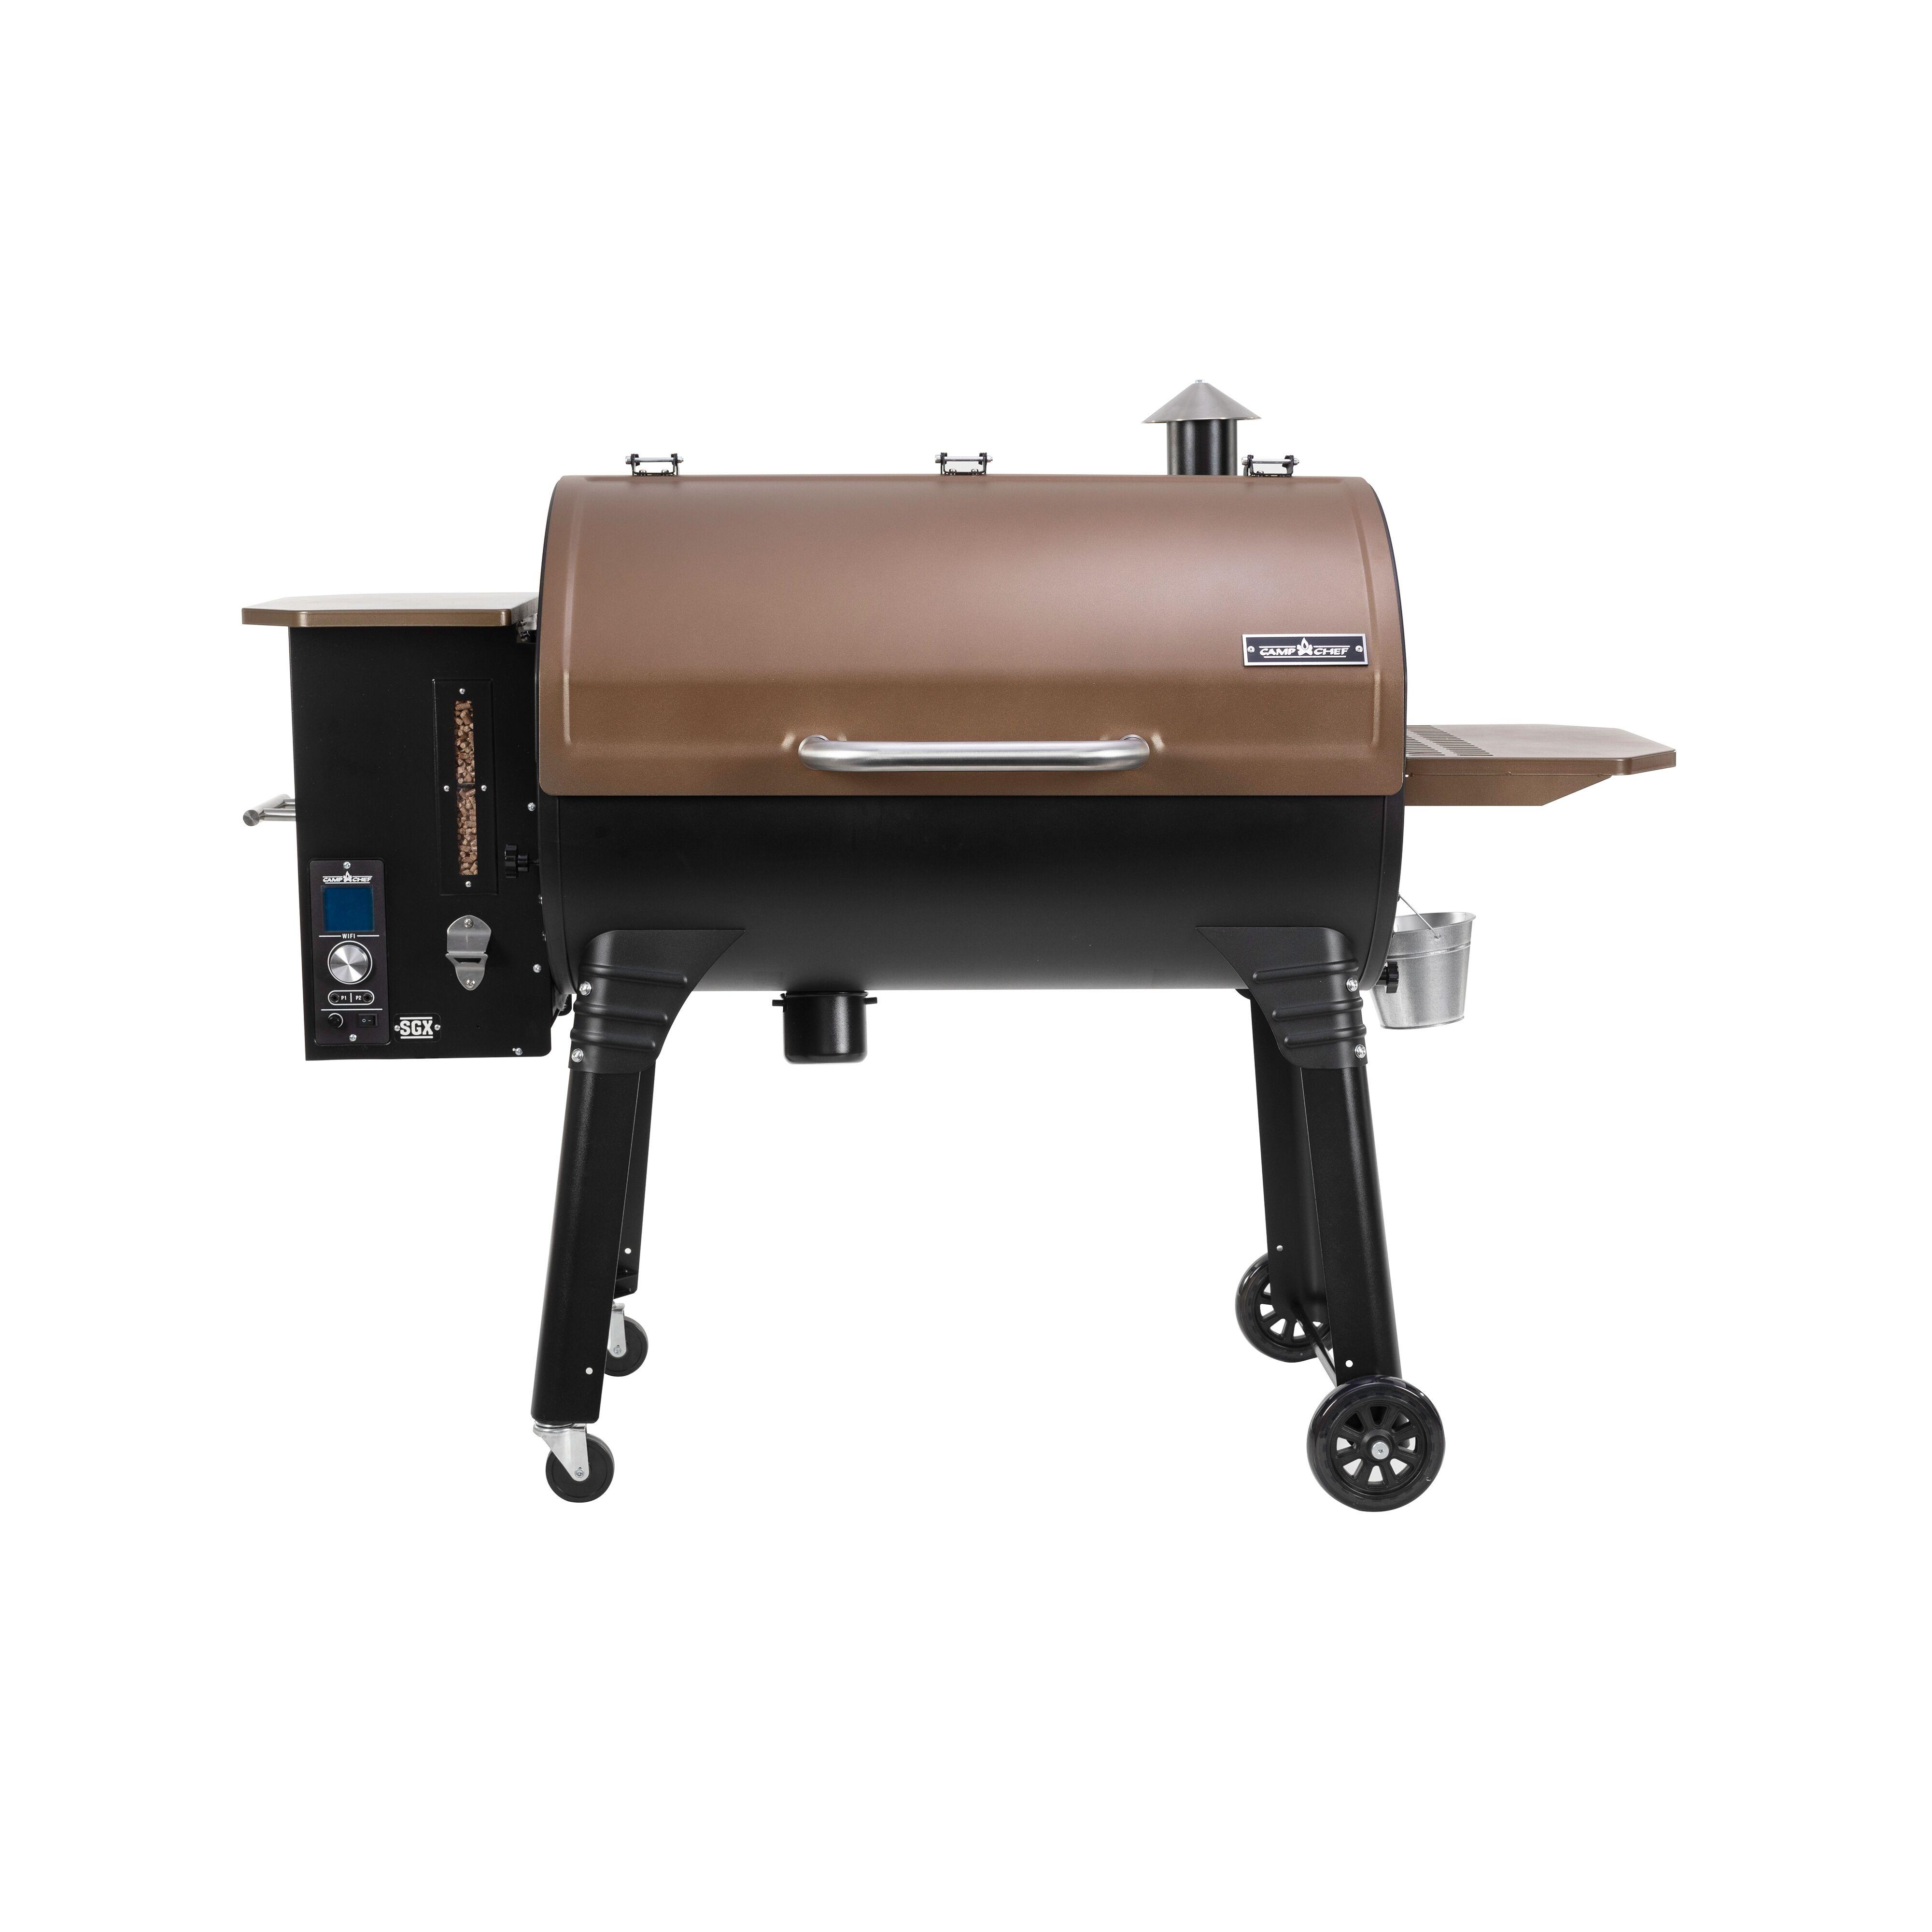 Camp Chef SmokePro SGX WIFI Pellet Grill - Bronze